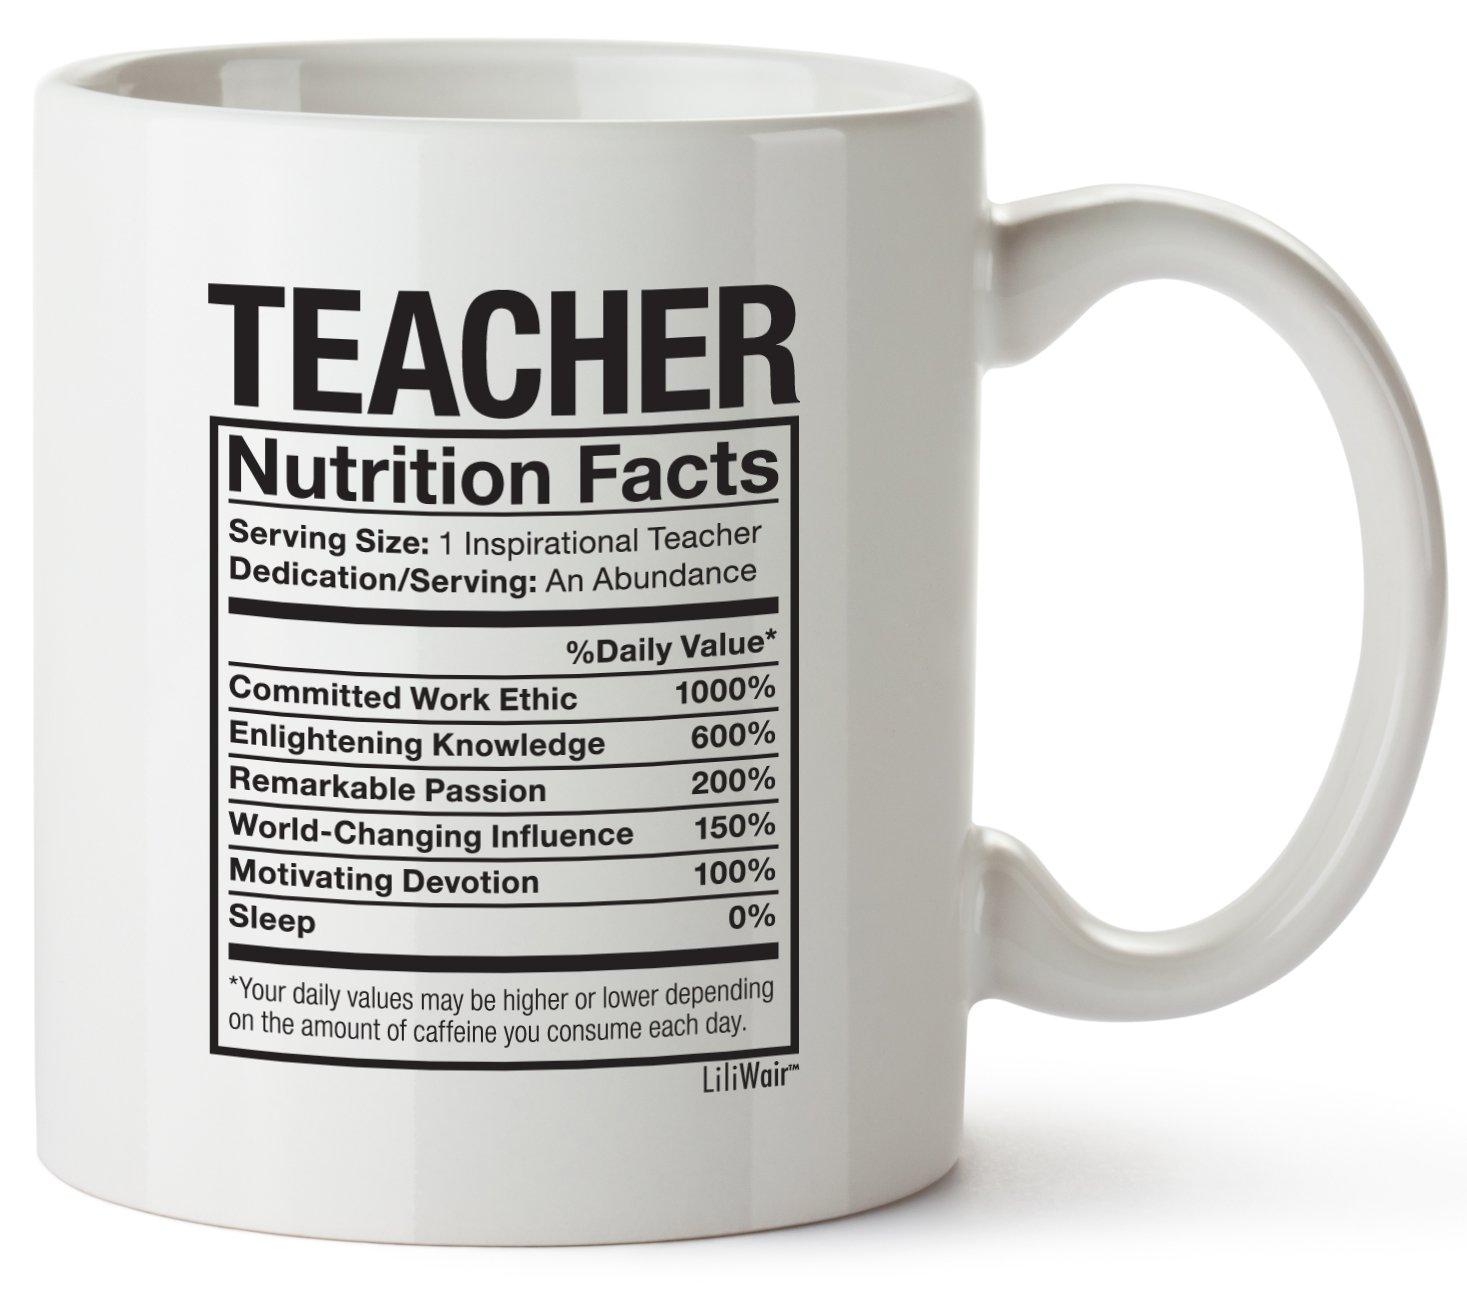 Teacher Appreciation Gifts Day Gift Boyfriend Girlfriend Coffee Mug Cup Funny Gift for Spanish Math Drama English Special Education Music History Science Kinder Garden Elementary Teachers